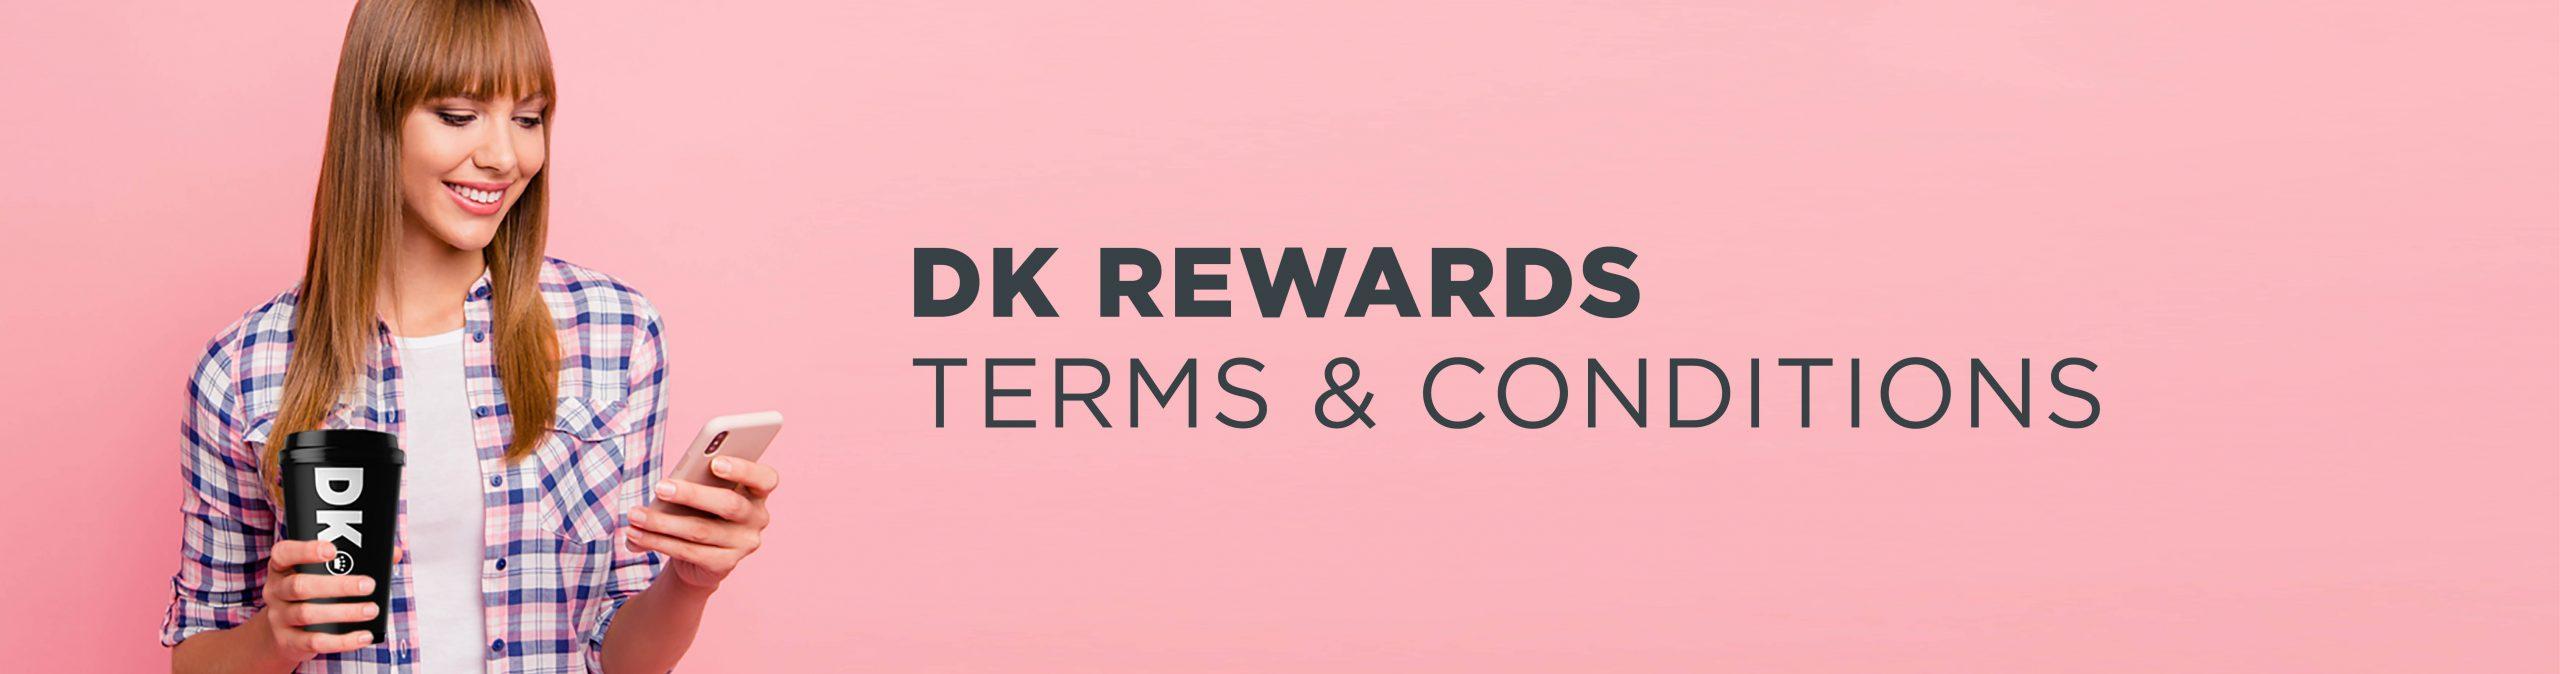 dk4212-dk-rewards-website-home-page-slider-1900x500px